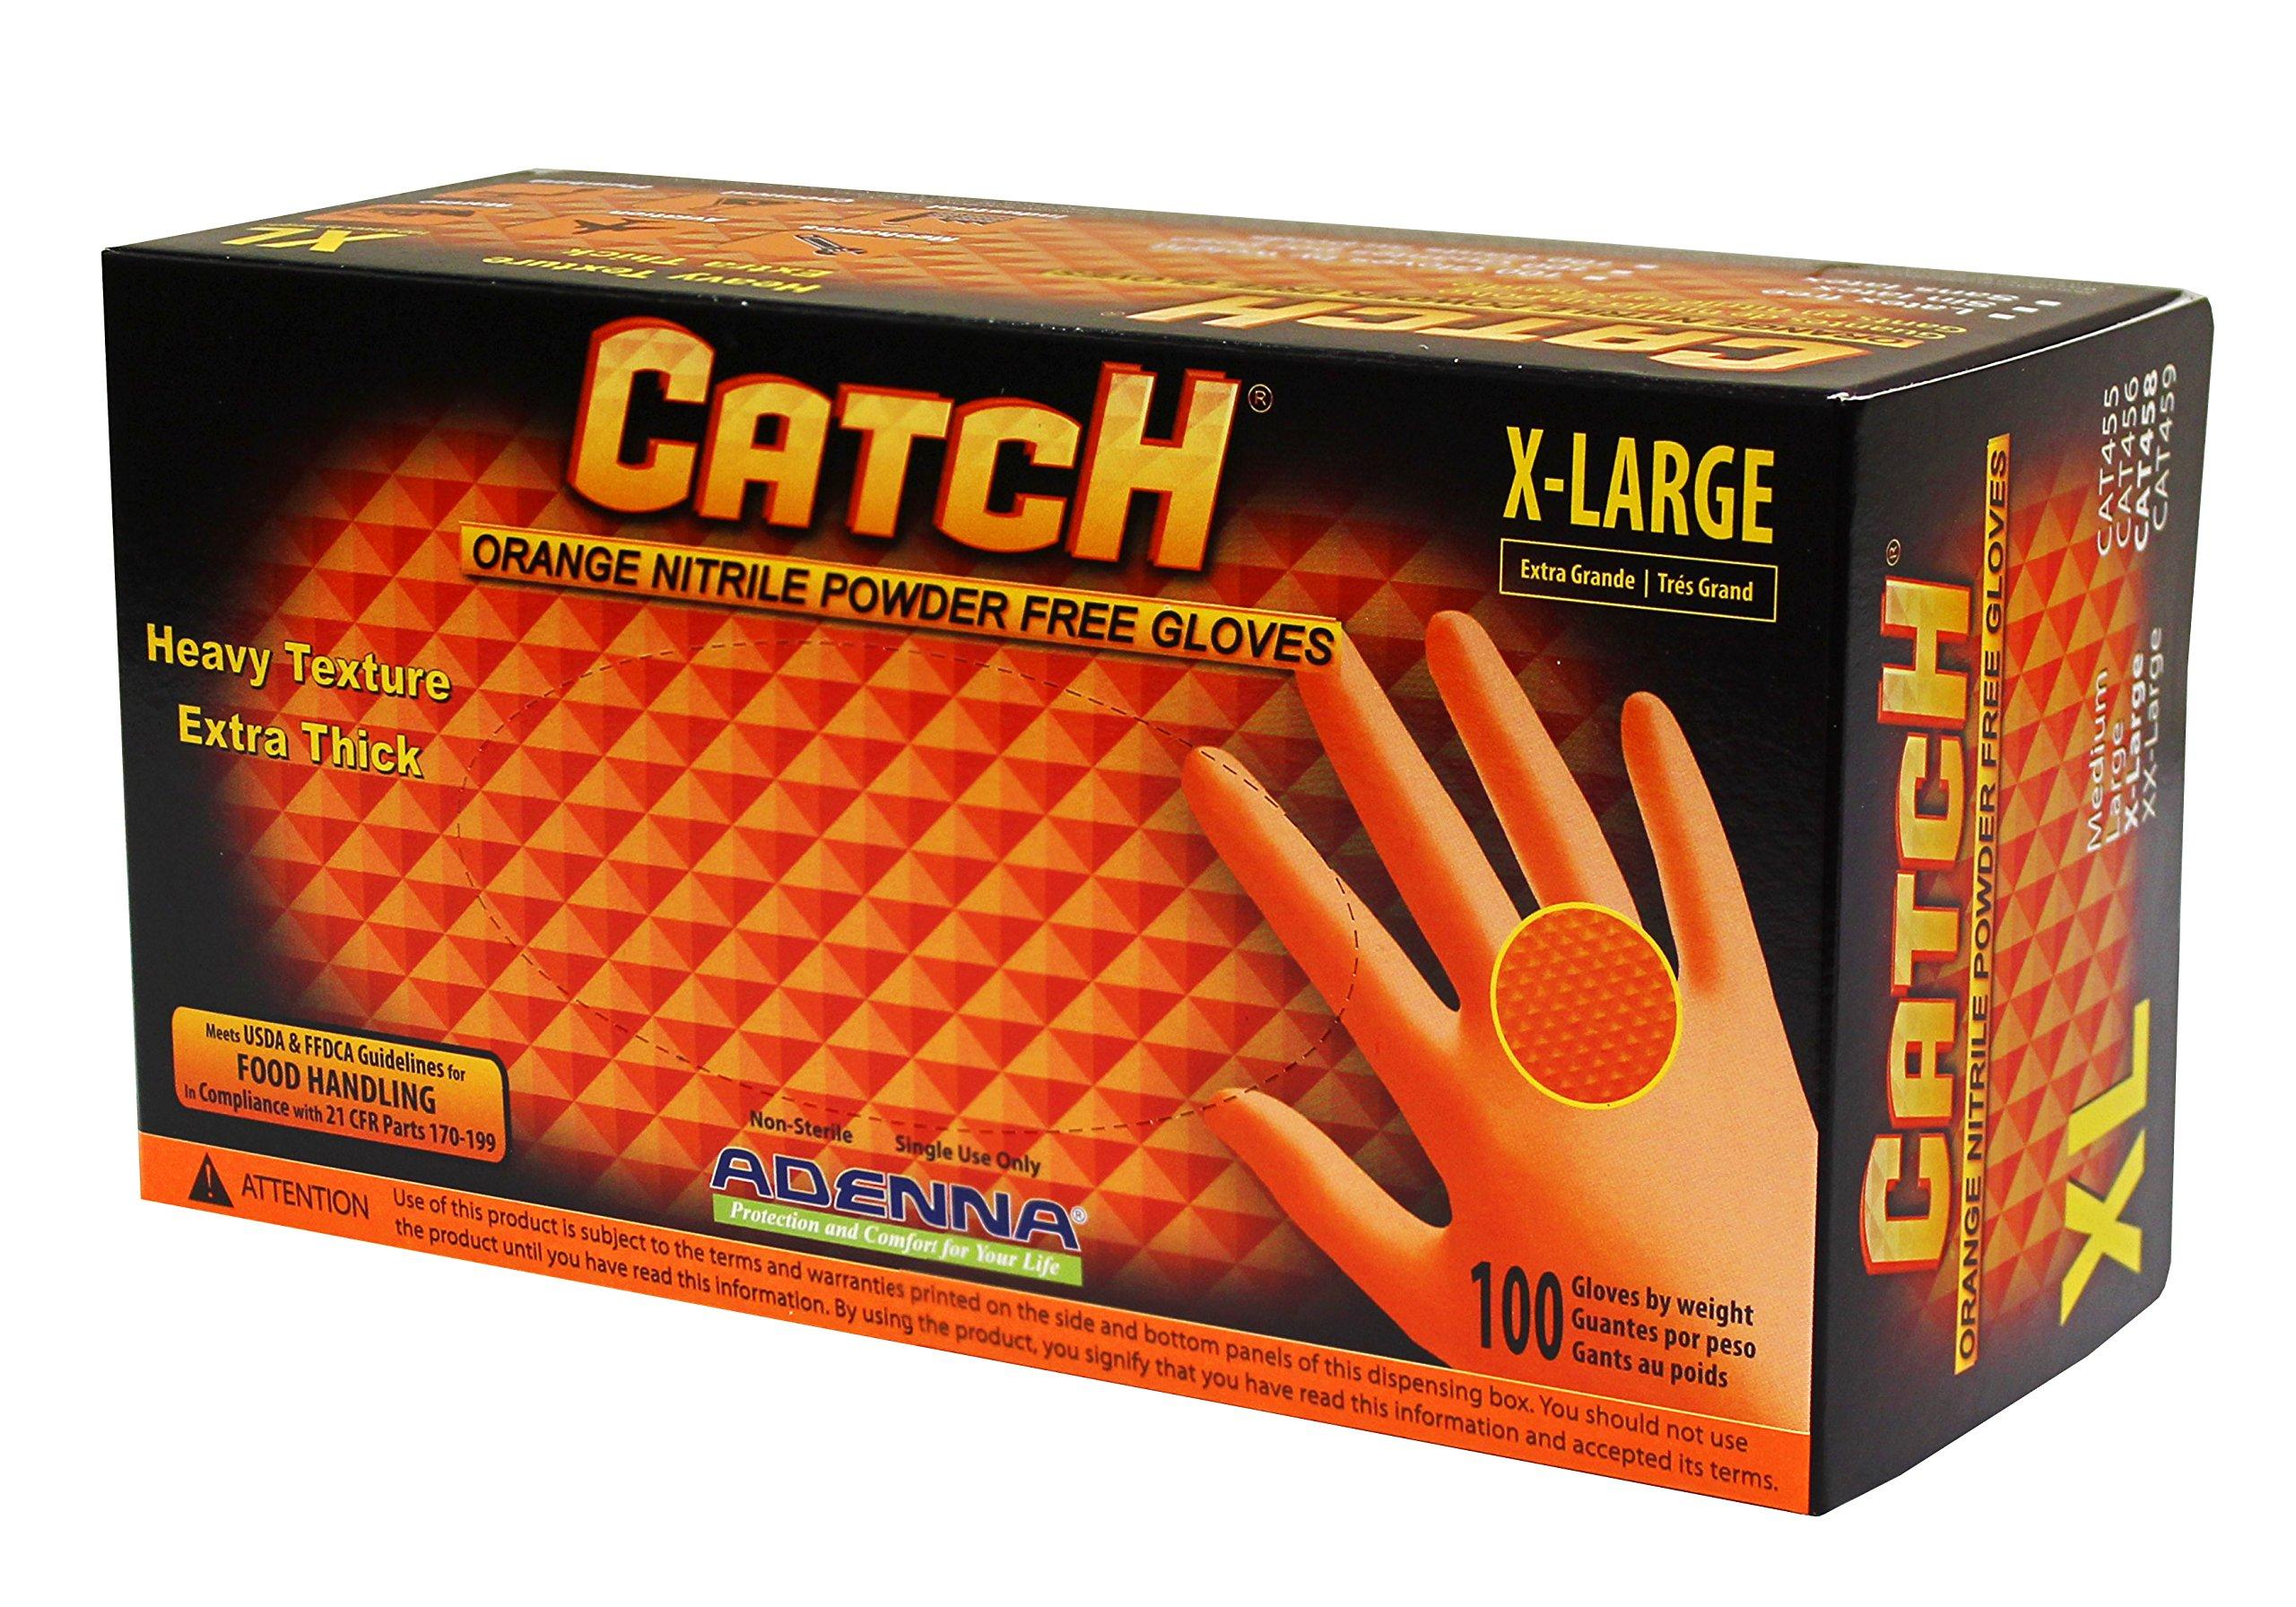 Adenna Catch 8 mil Nitrile Powder Free Gloves (Orange, X-Large) Box of 100 by Adenna